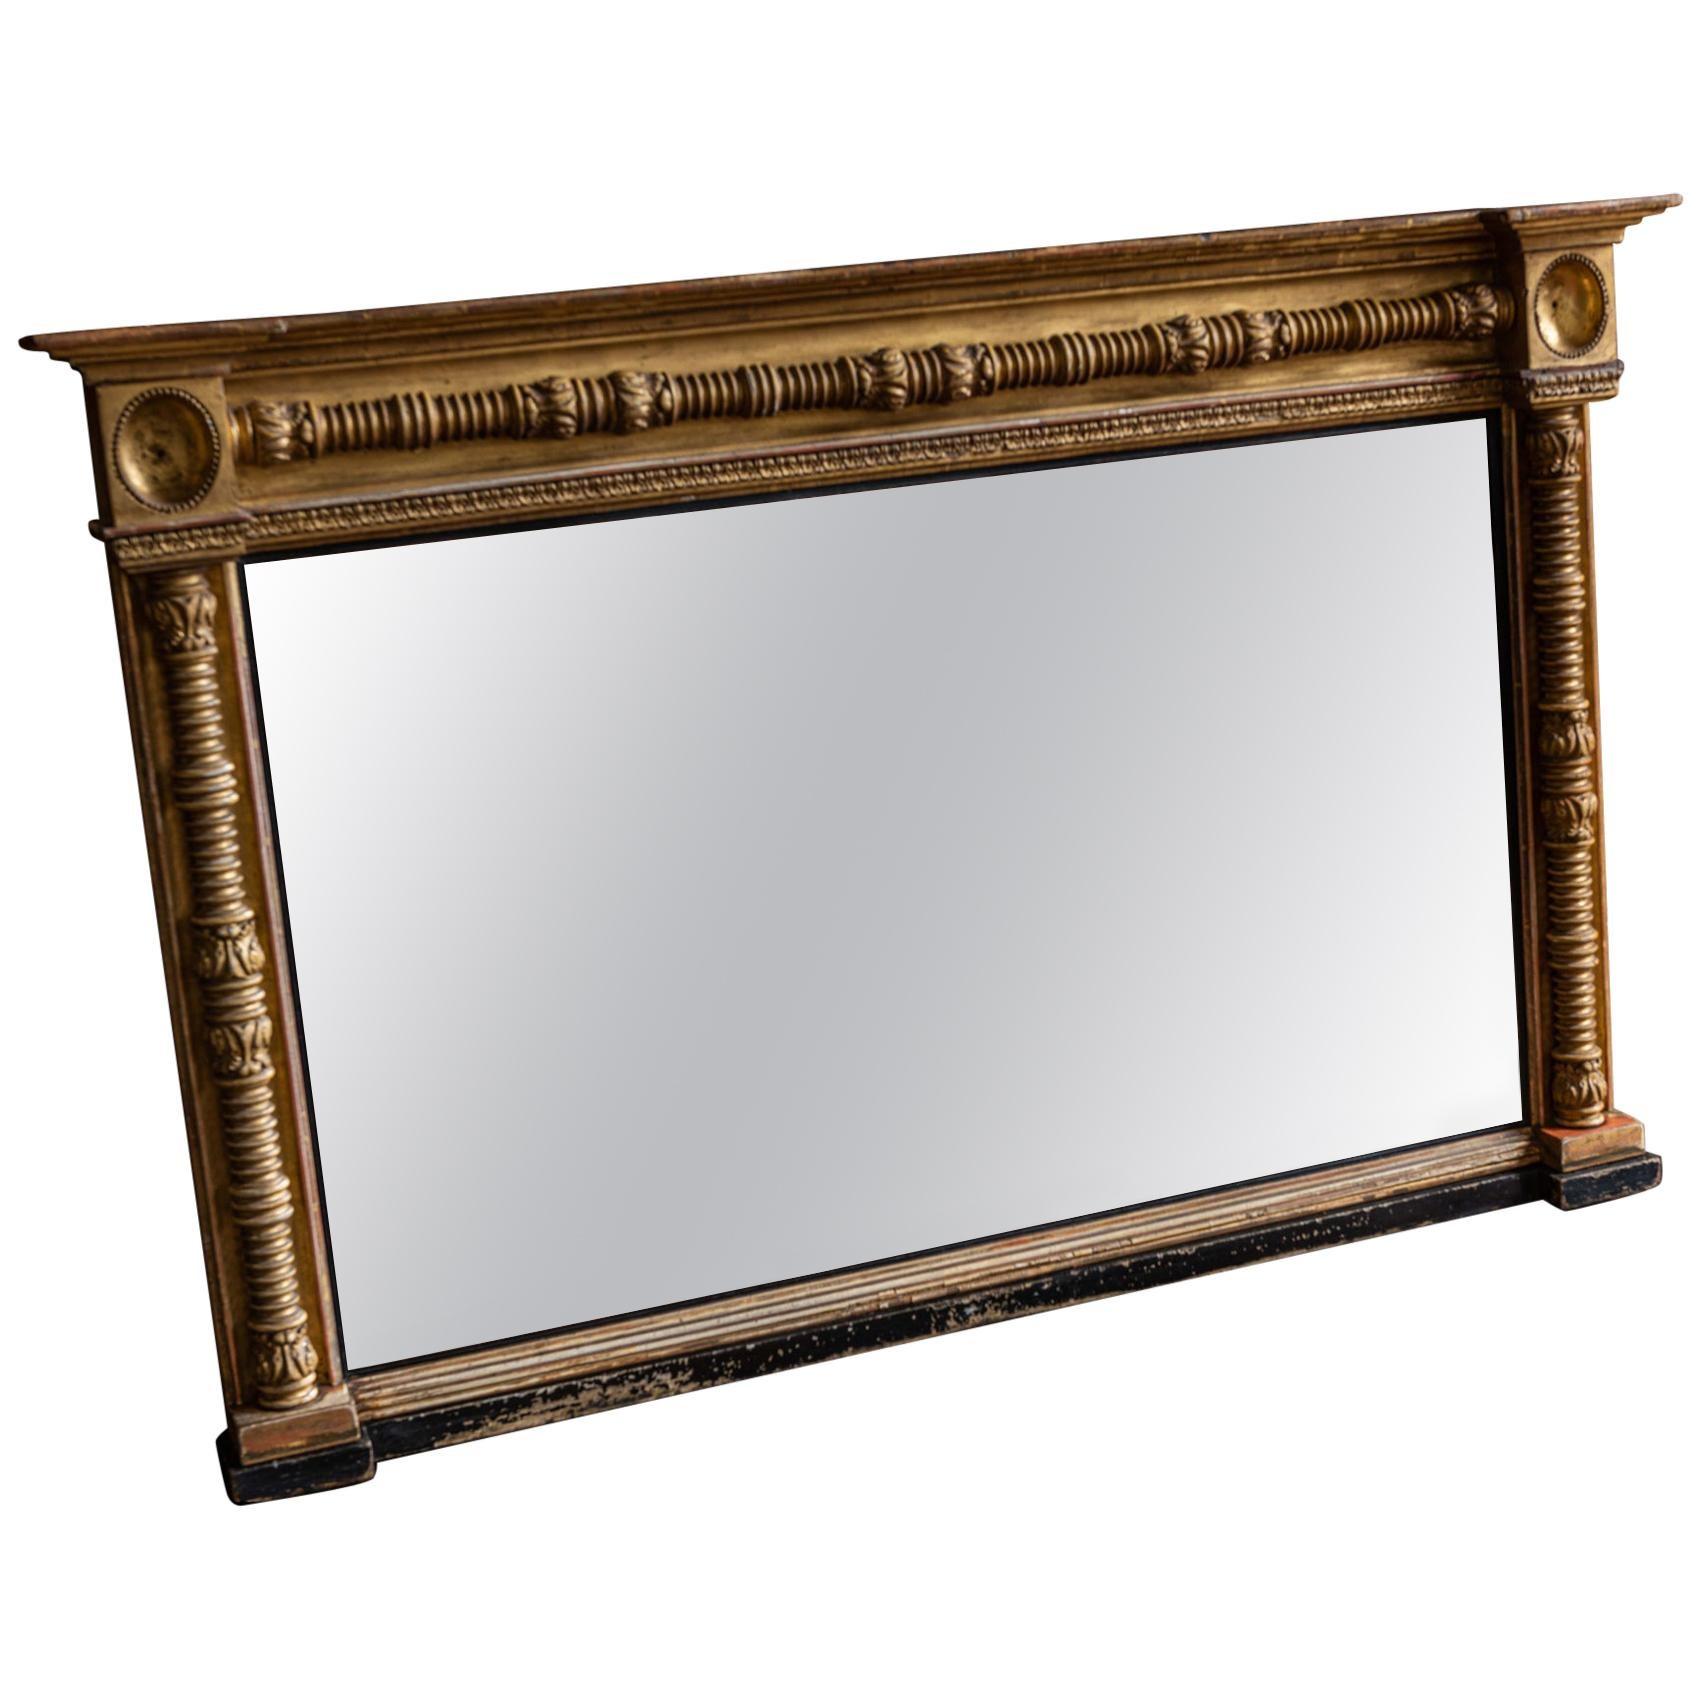 English 19th Century Gilt and Ebonized Bevelled Overmantle Mirror